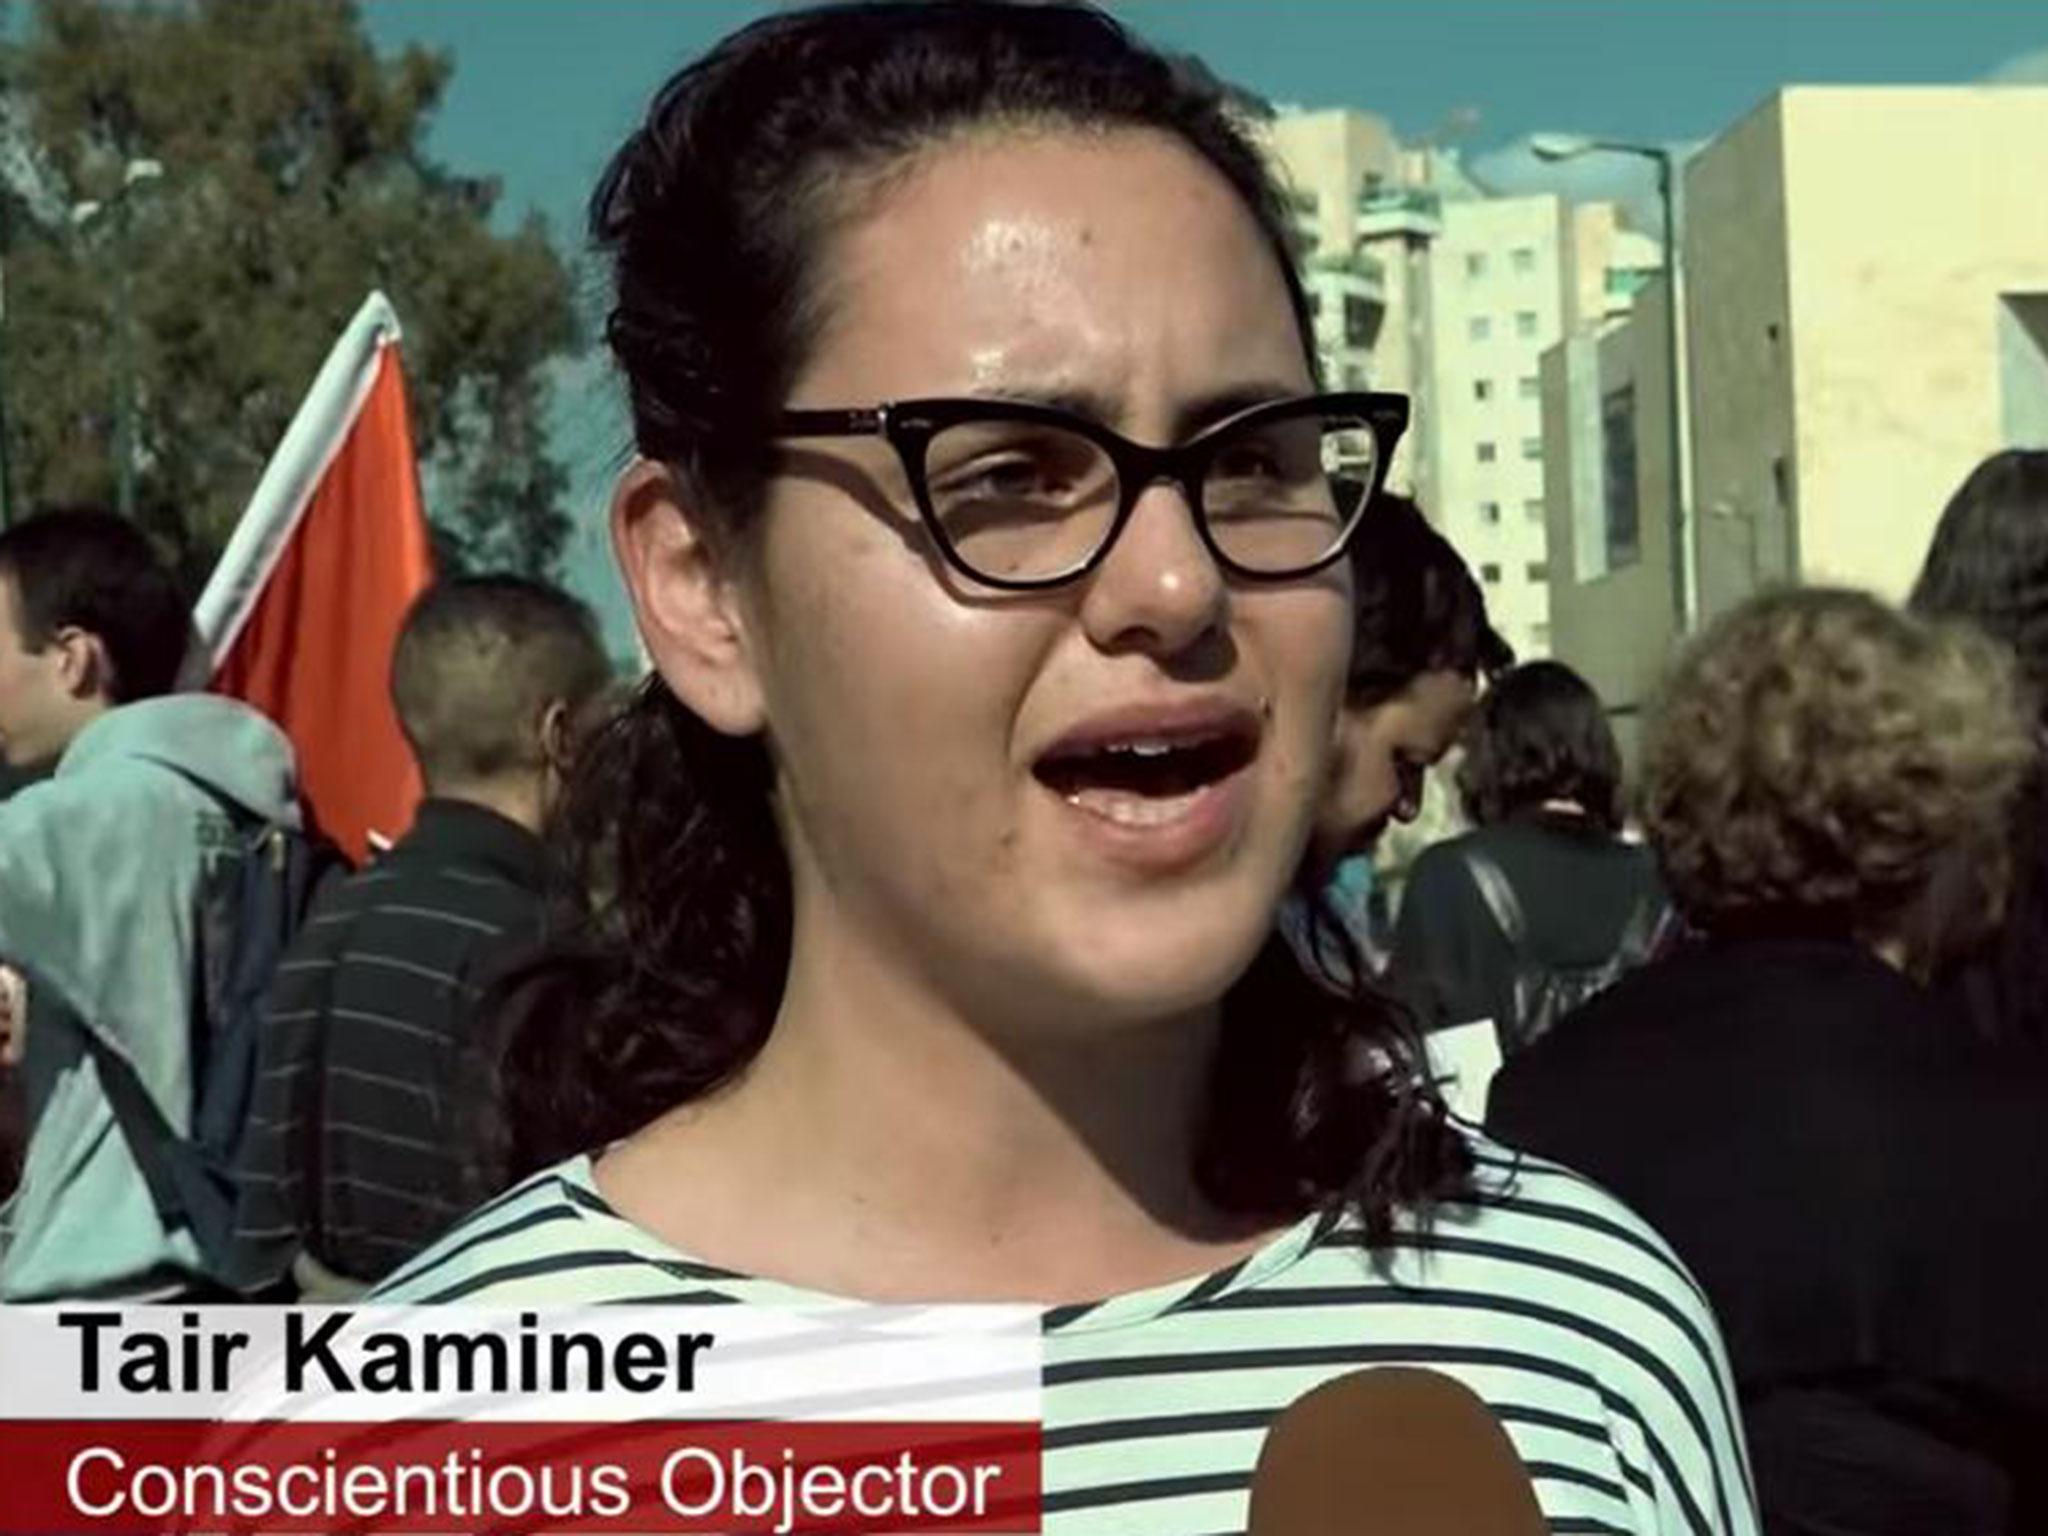 Tair Kaminer